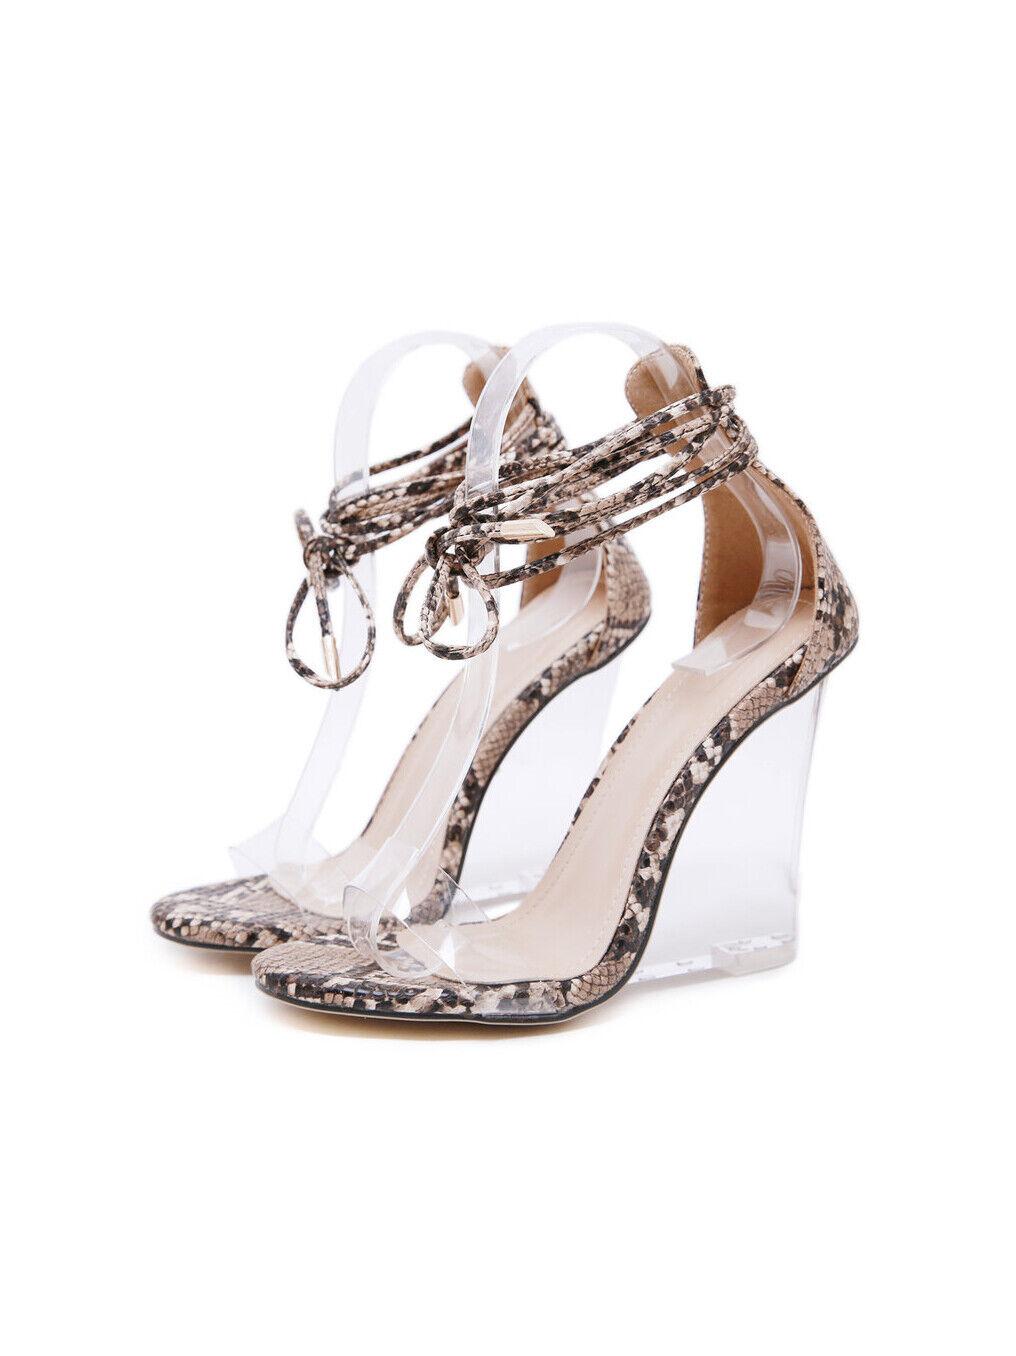 Sandalias Elegante Cuero Sintético Elegante Beige Transparente Cuña 12cm cw202